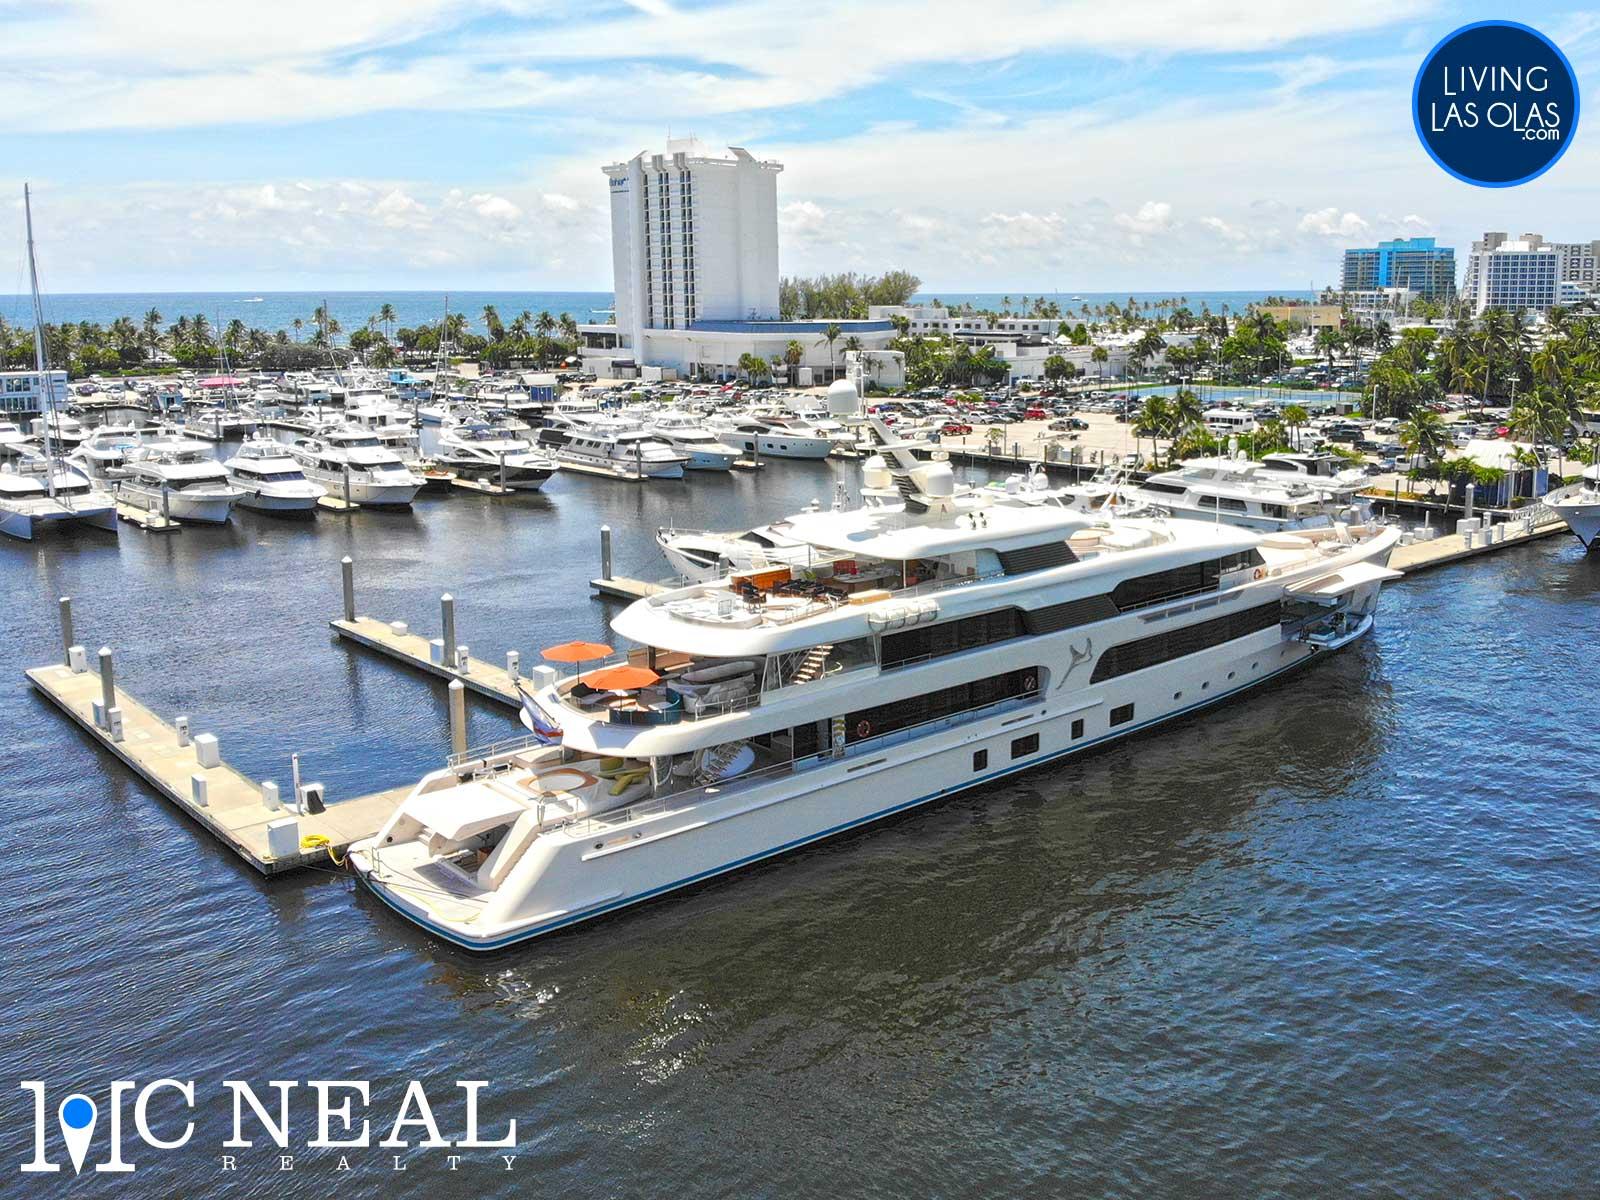 Fort Lauderdale International Boat Show Images 02